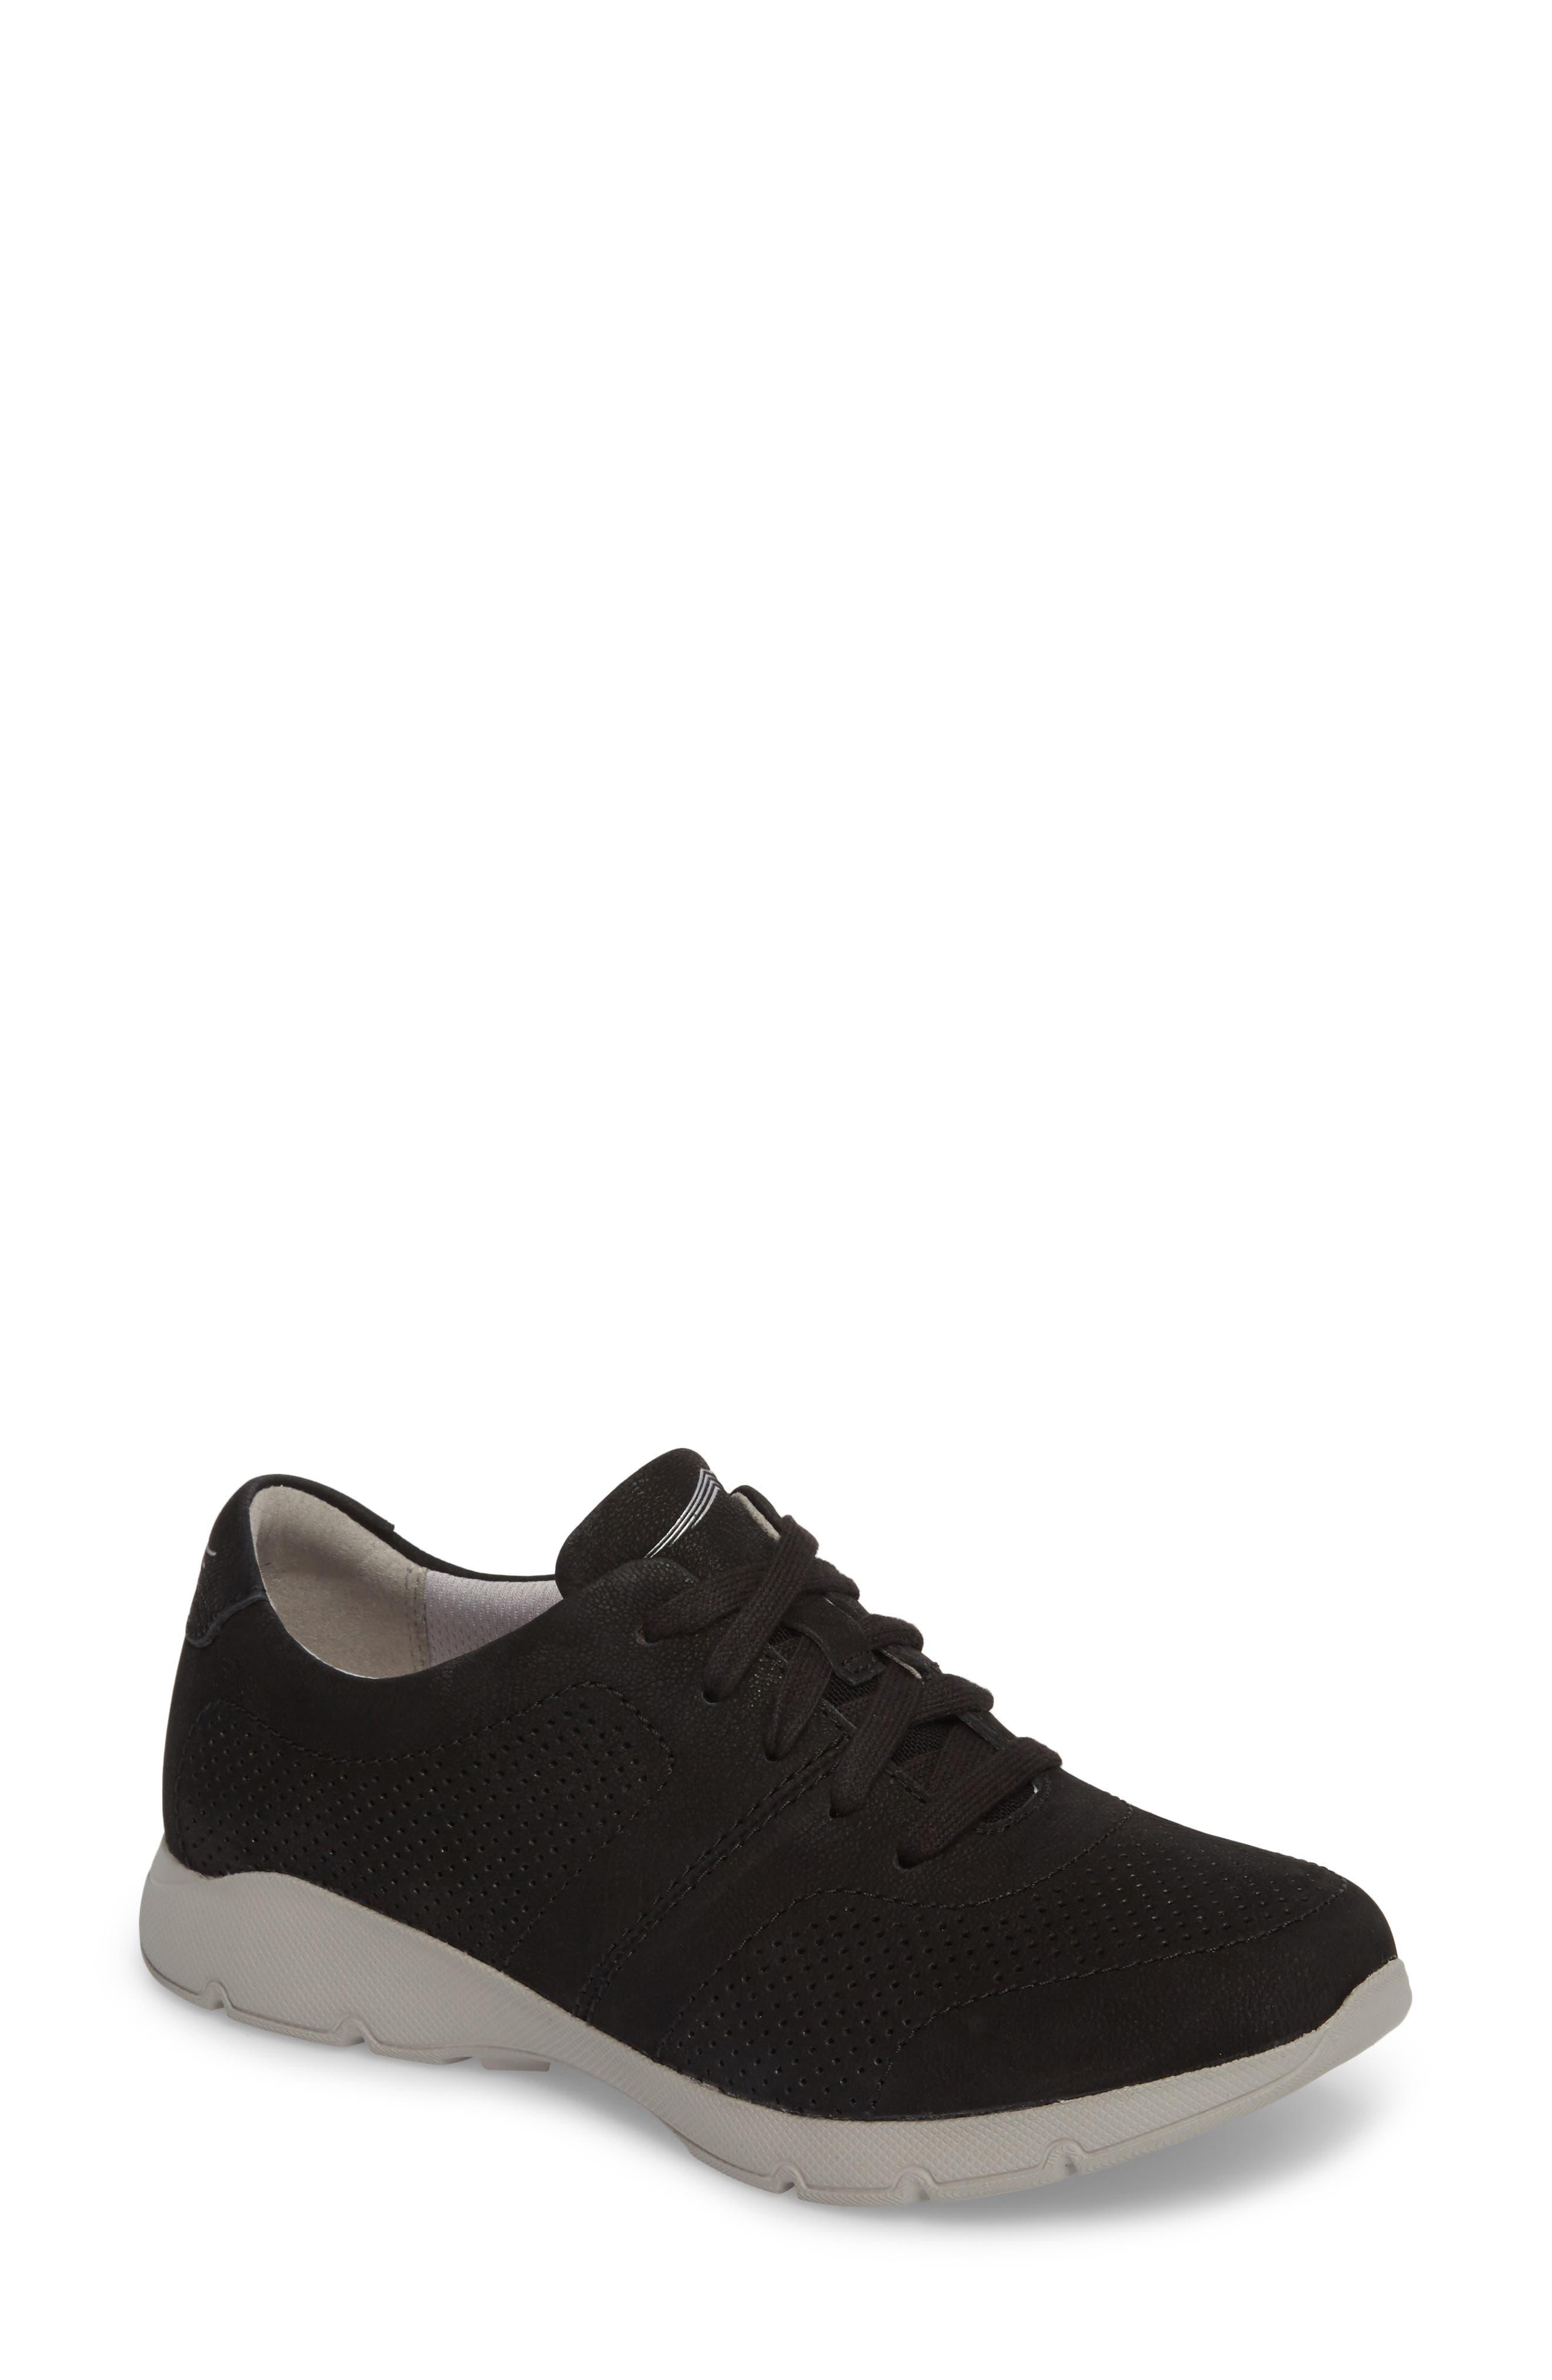 Alissa Sneaker,                         Main,                         color, BLACK MILLED NUBUCK LEATHER